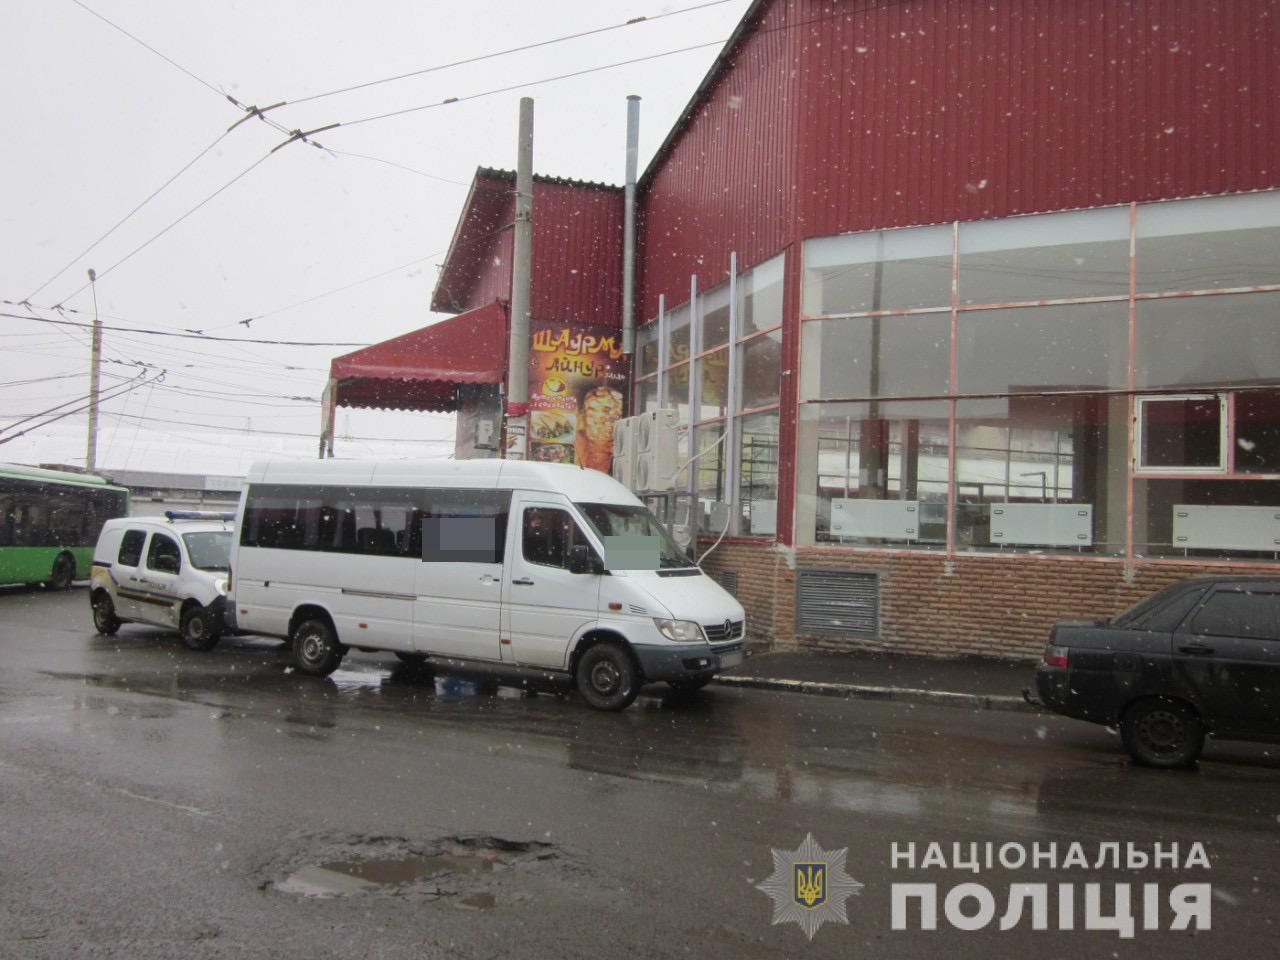 Поранив ножем і втік: у Харкові стався конфлікт між водіями маршруток